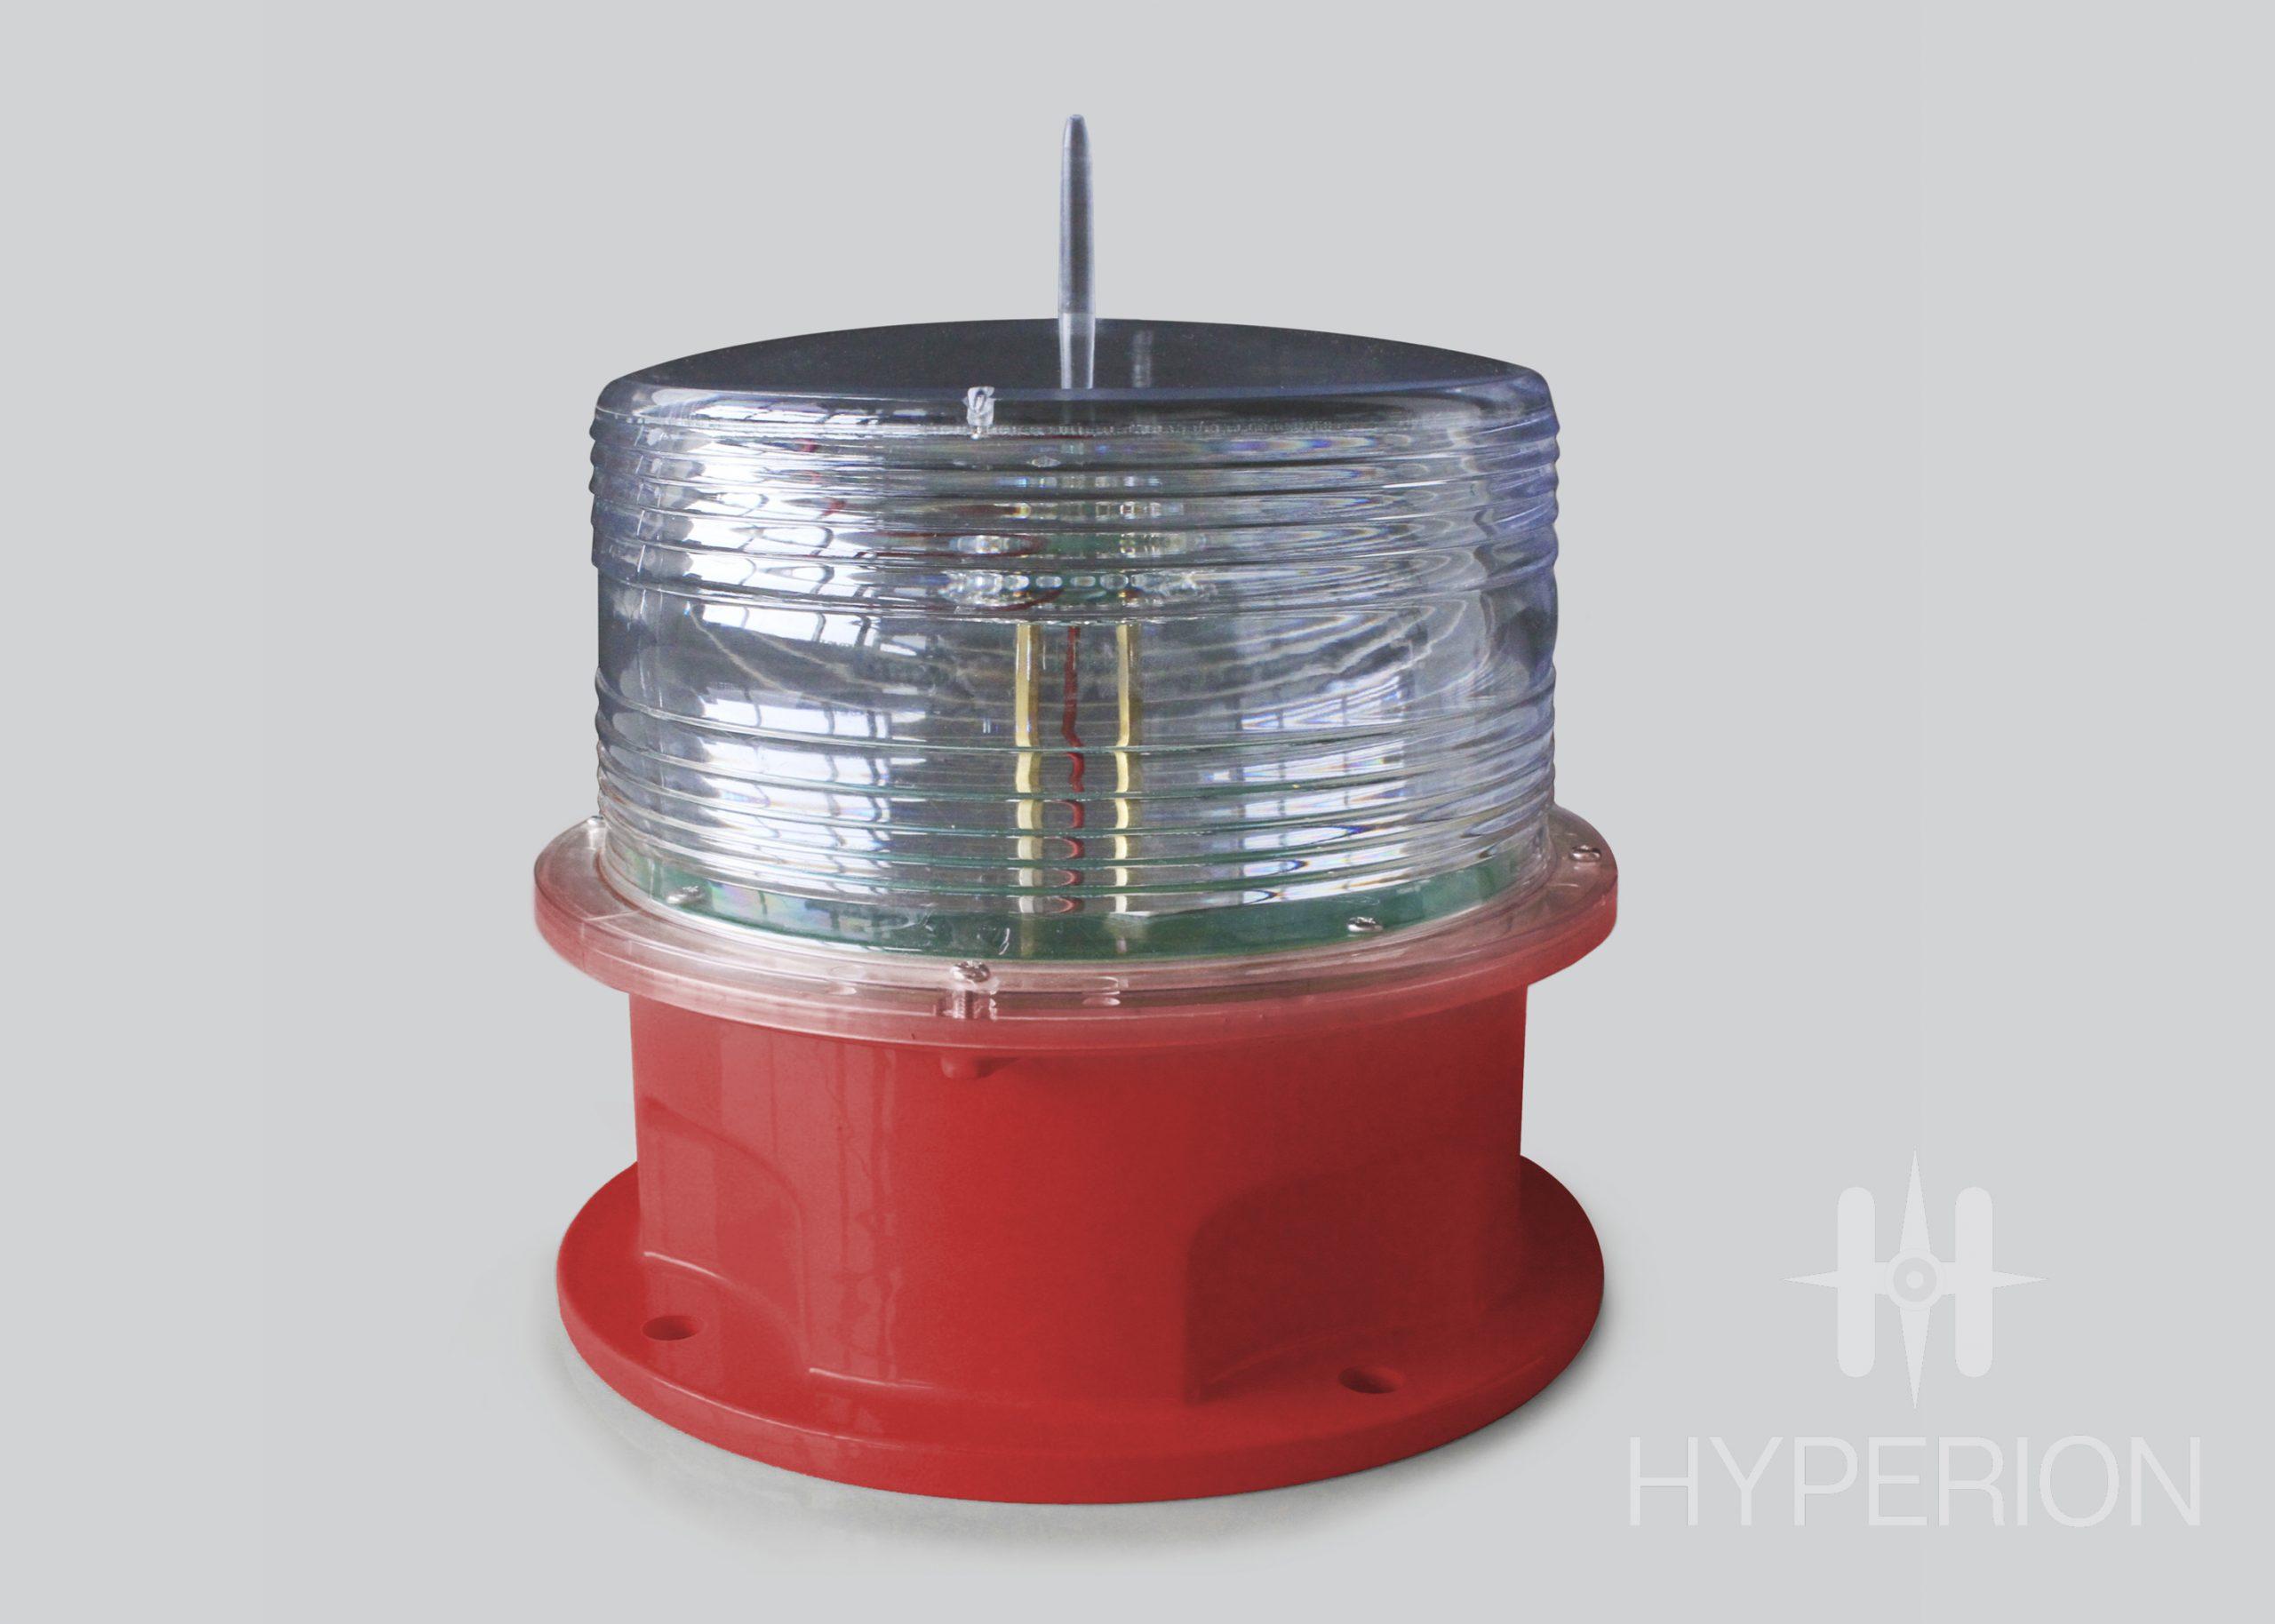 Hyperion HL-3